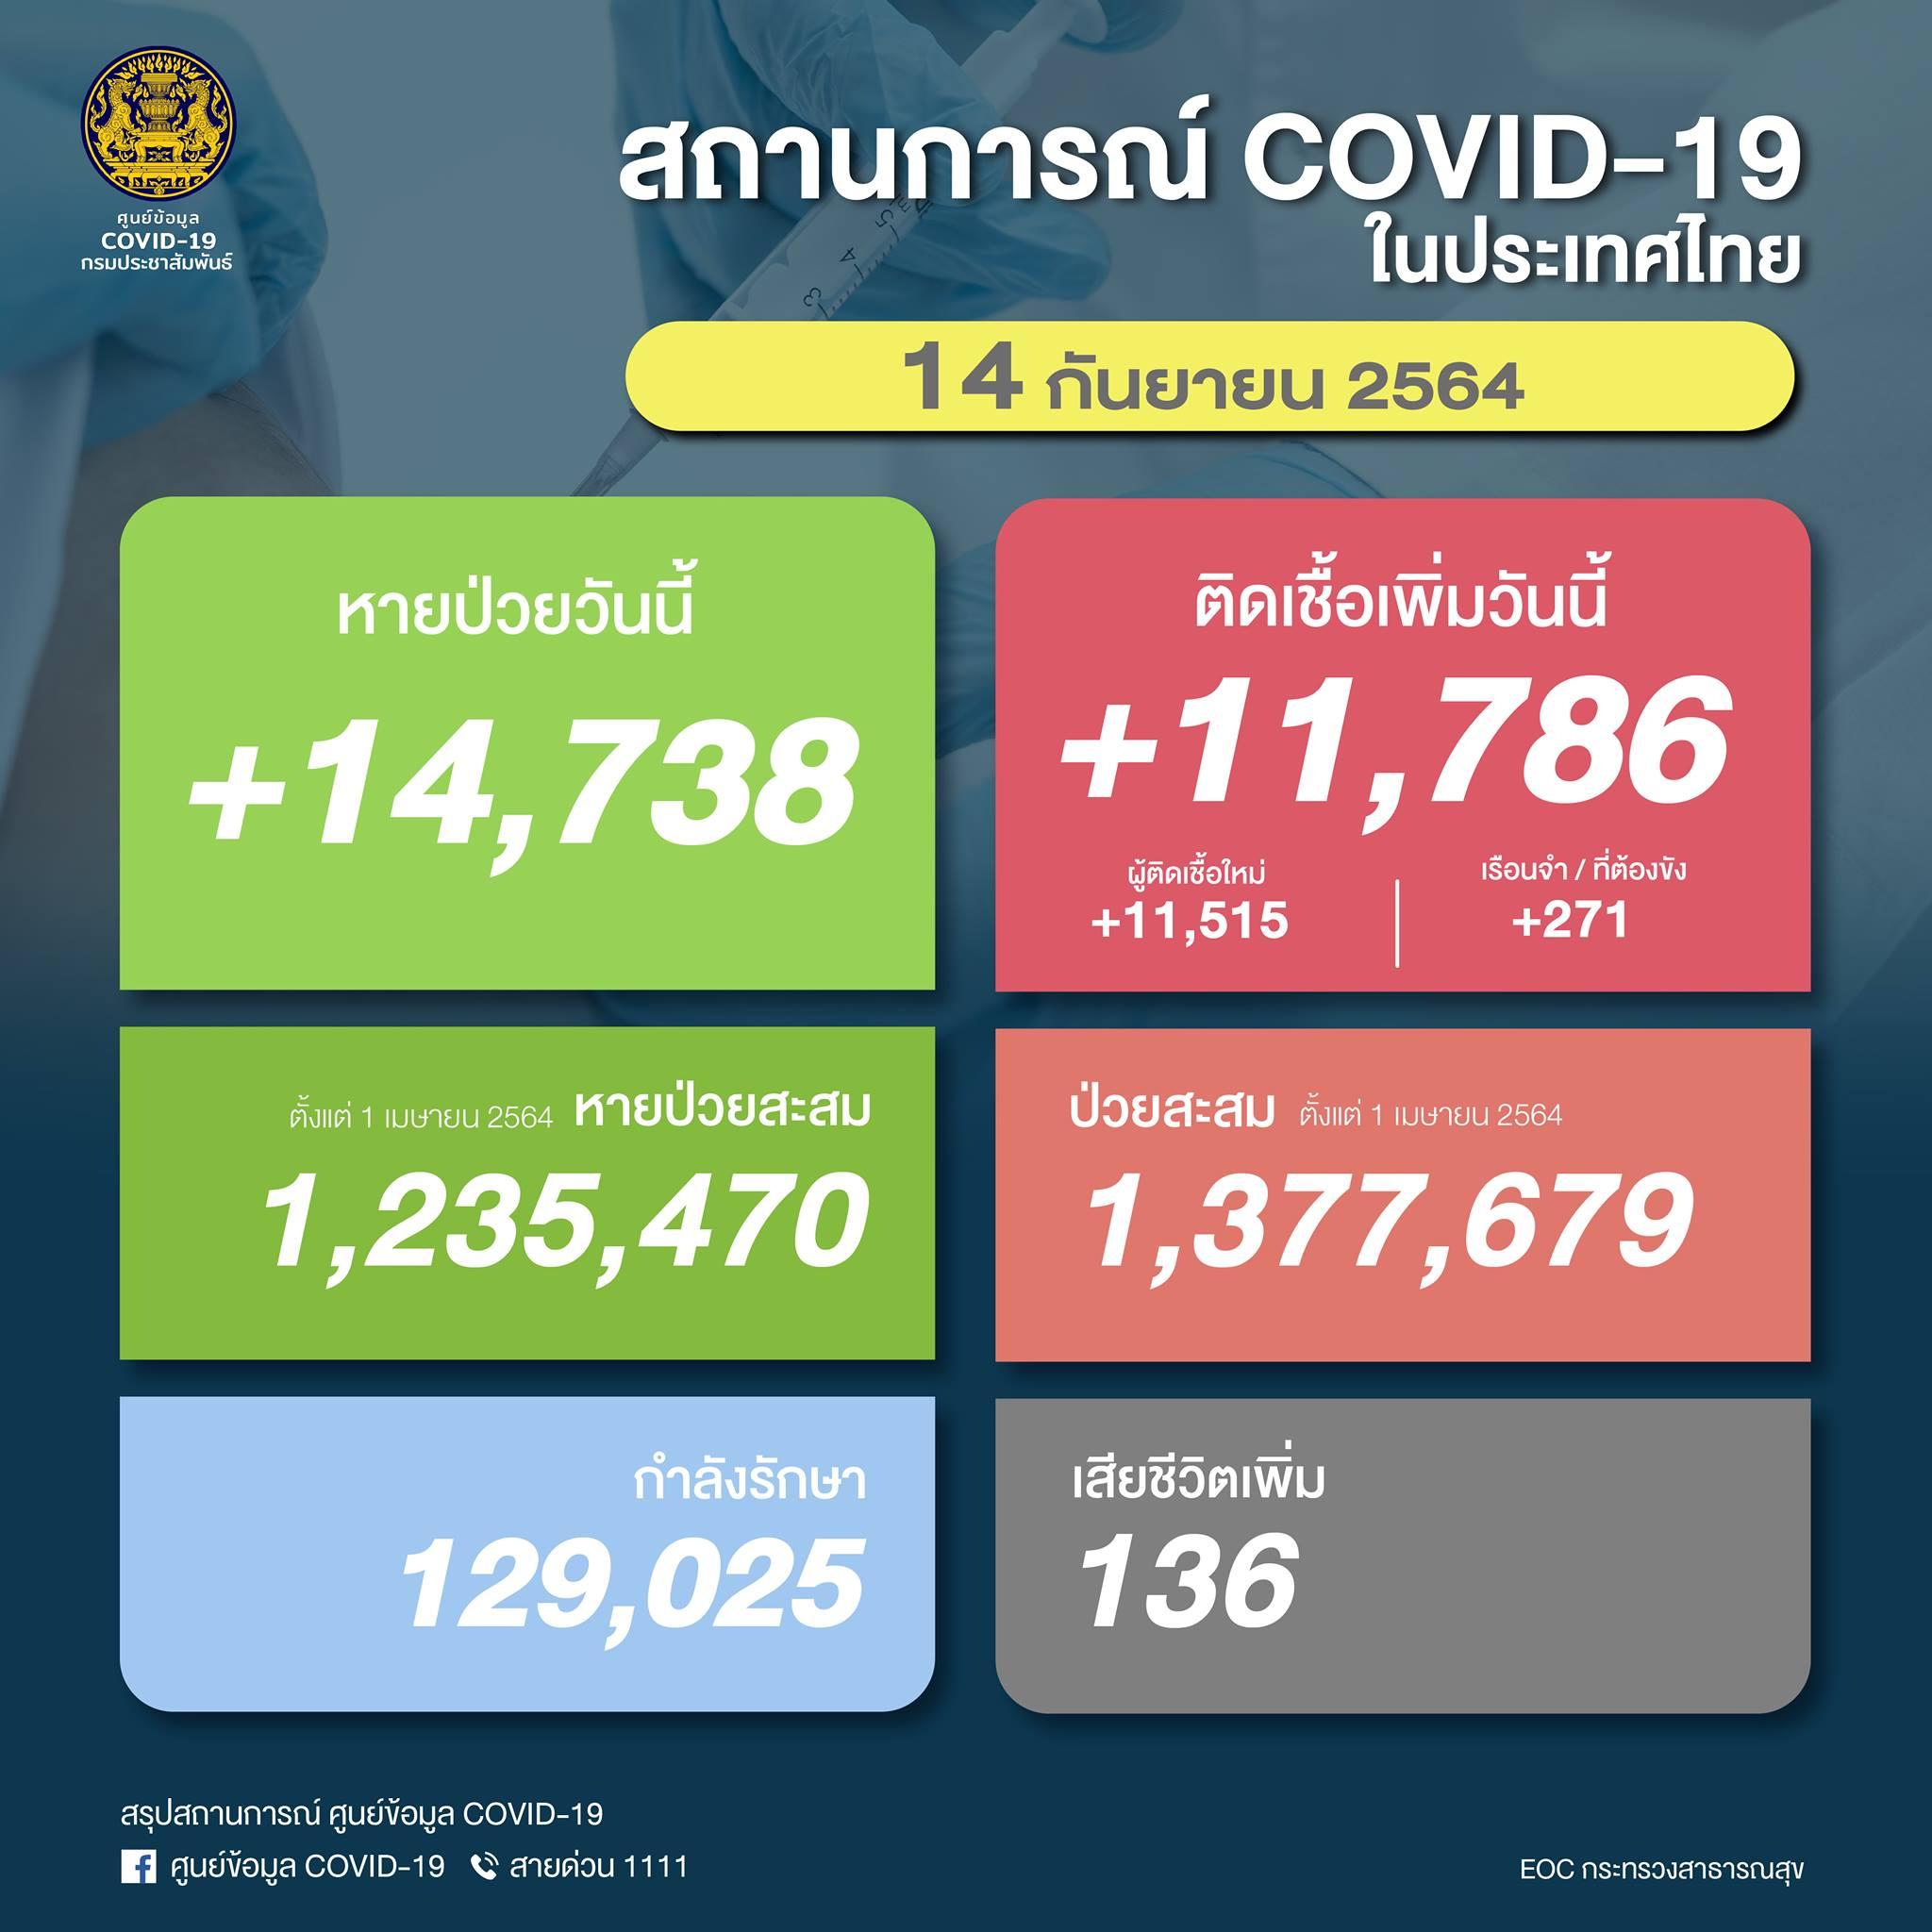 May be an image of text that says 'CVID- กรมประซาสัมพันธ์ สถานการณ์ COVID-19 ในประเทศไทย 14 กันยายน 2564 หายป่วยวันนี้ +14,738 +14, ติดเชื้อเพิ่มวันนี้ +11,786 ผู้ติดเชื้อใหม่ เรือนจำ/ ที่ต้องขัง +11,515 +271 ตังแต่ เมษายน2564 หายป่วยสะสม 1,235,470 ป่วยสะสม ตั้งแต่ เมษายน2564 1,377,679 กำลังรักษา 129,025 เสียชีวิตเพิ่ม 136 สรุปสถานการณ์ ศูนย์ข้อมูล COVID-19 f ศูนย์ข้อมูล COVID-19 สายด่วน EOCกระทรวงสาธารณสุข'